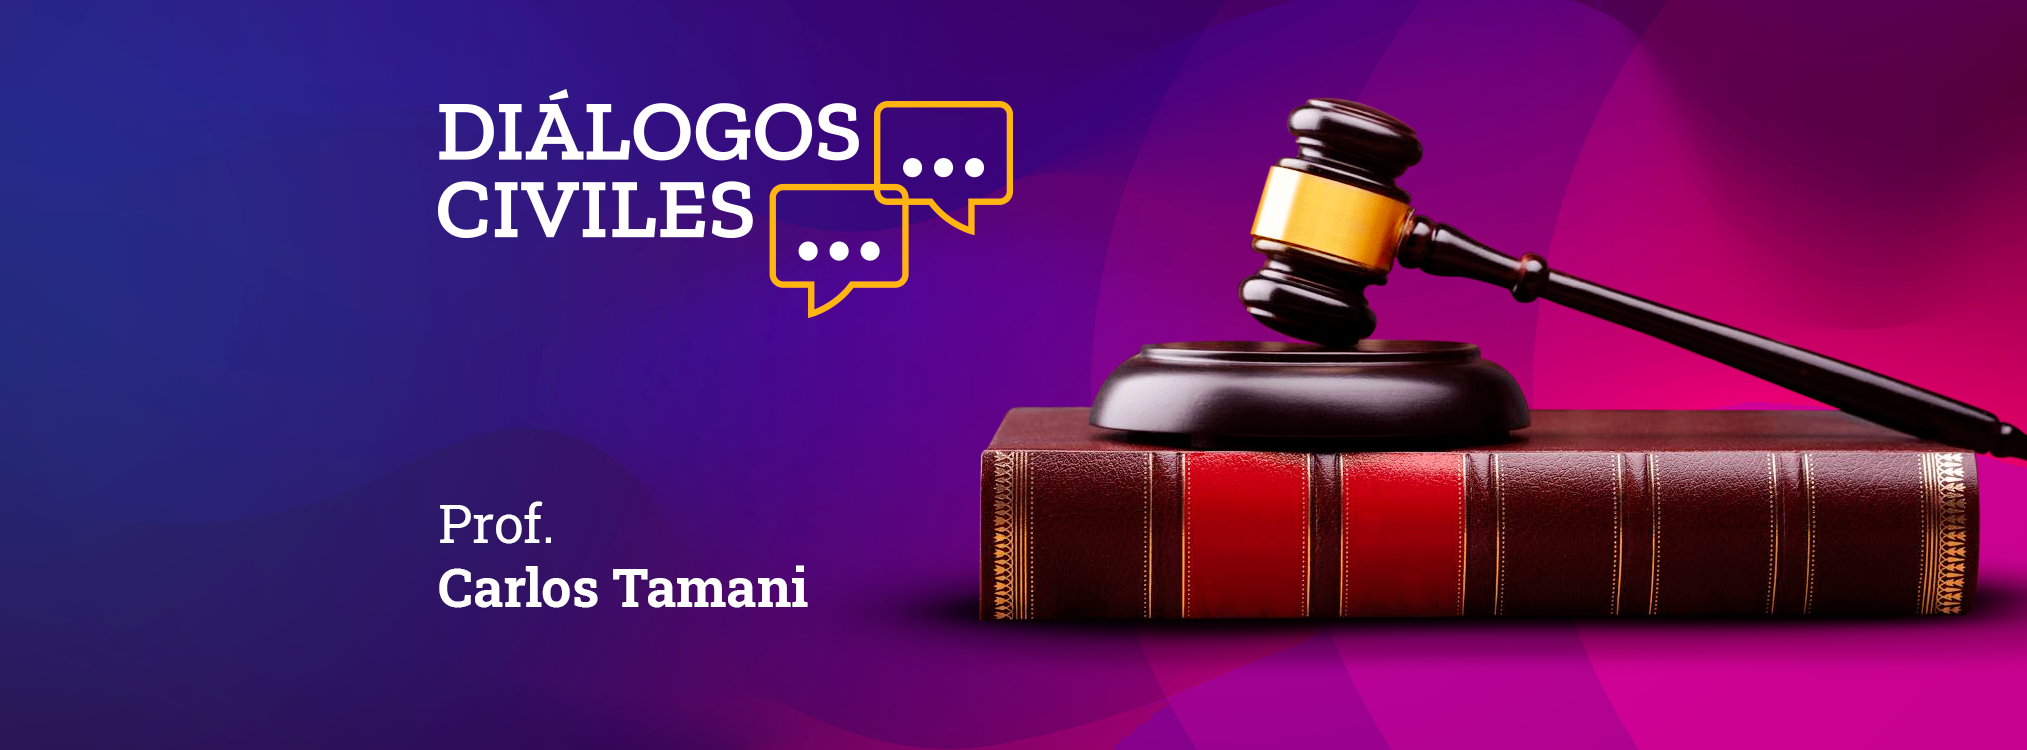 Carlos Tamani Rafael | Diálogos Civiles